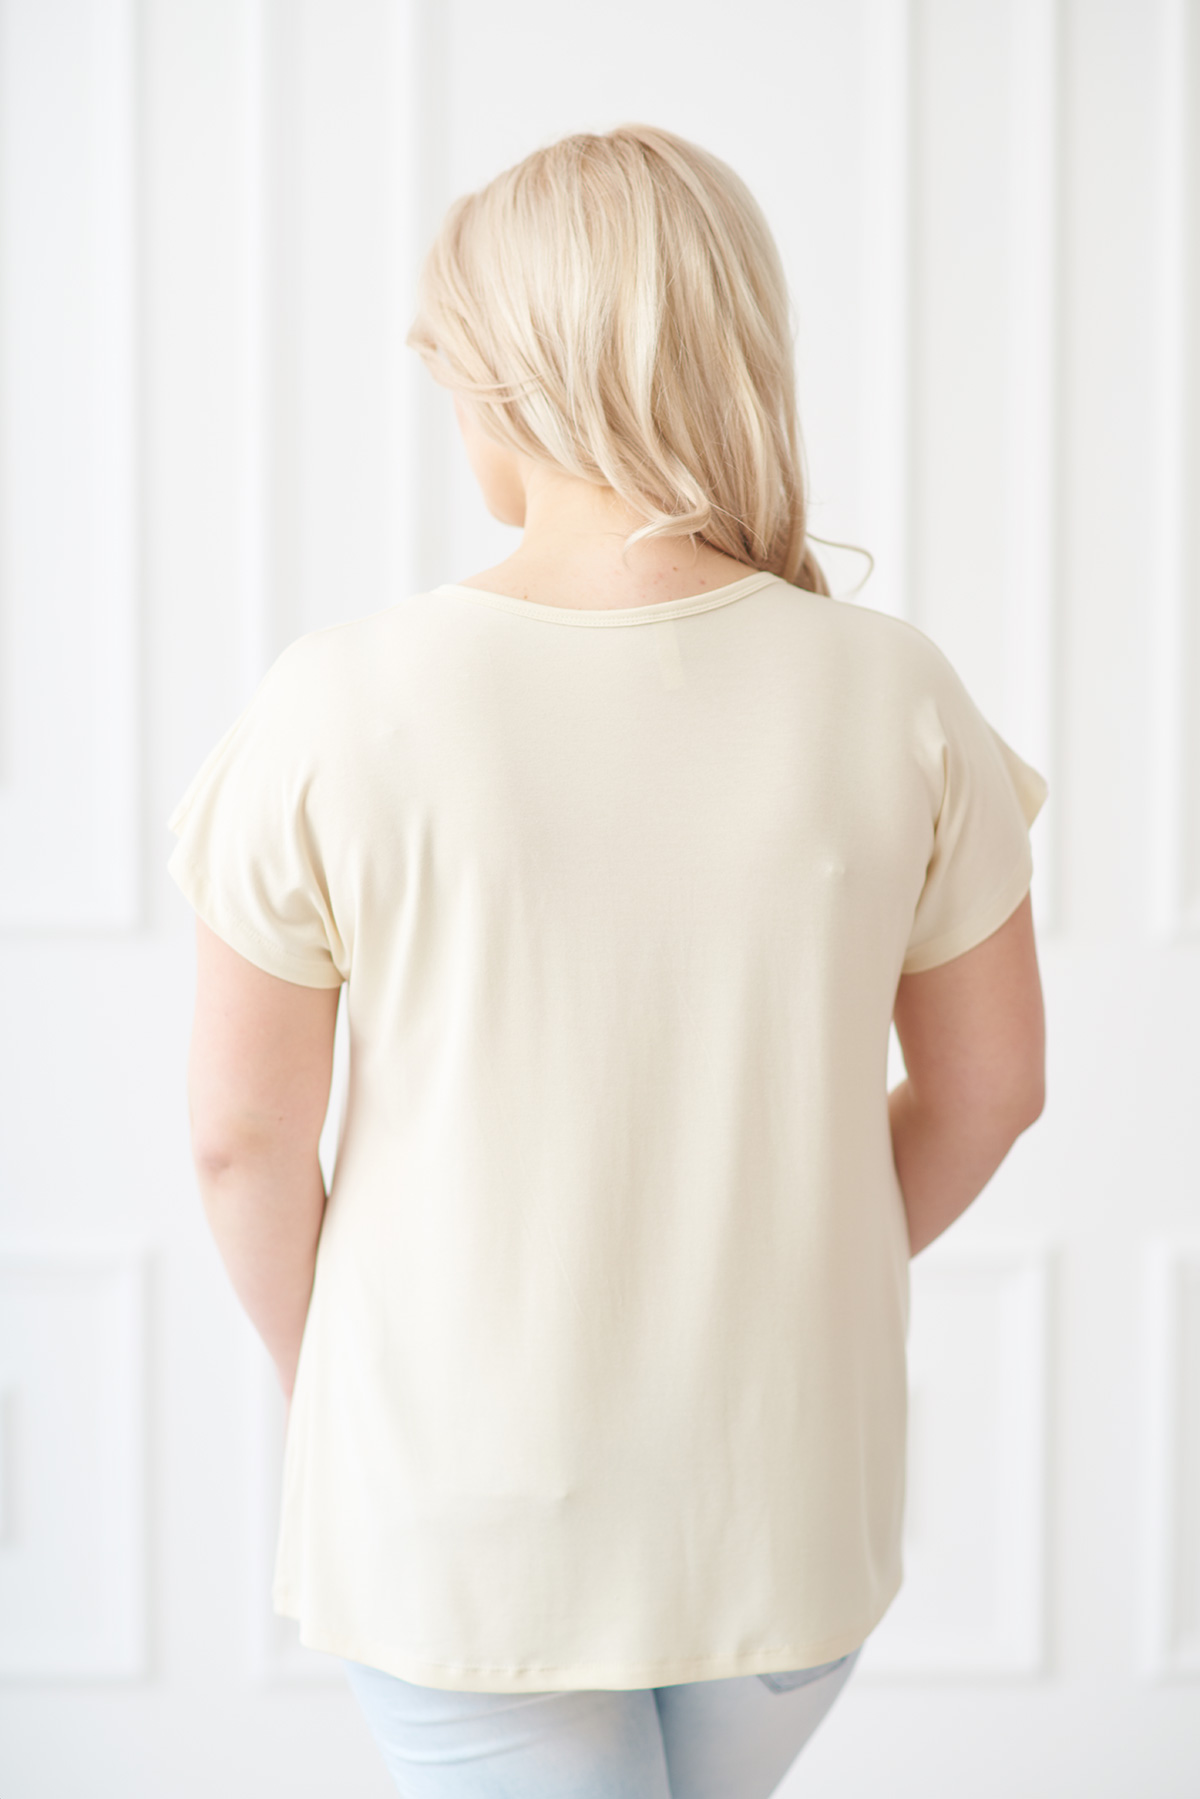 Жен. футболка арт. 19-0147 экрю р. 58